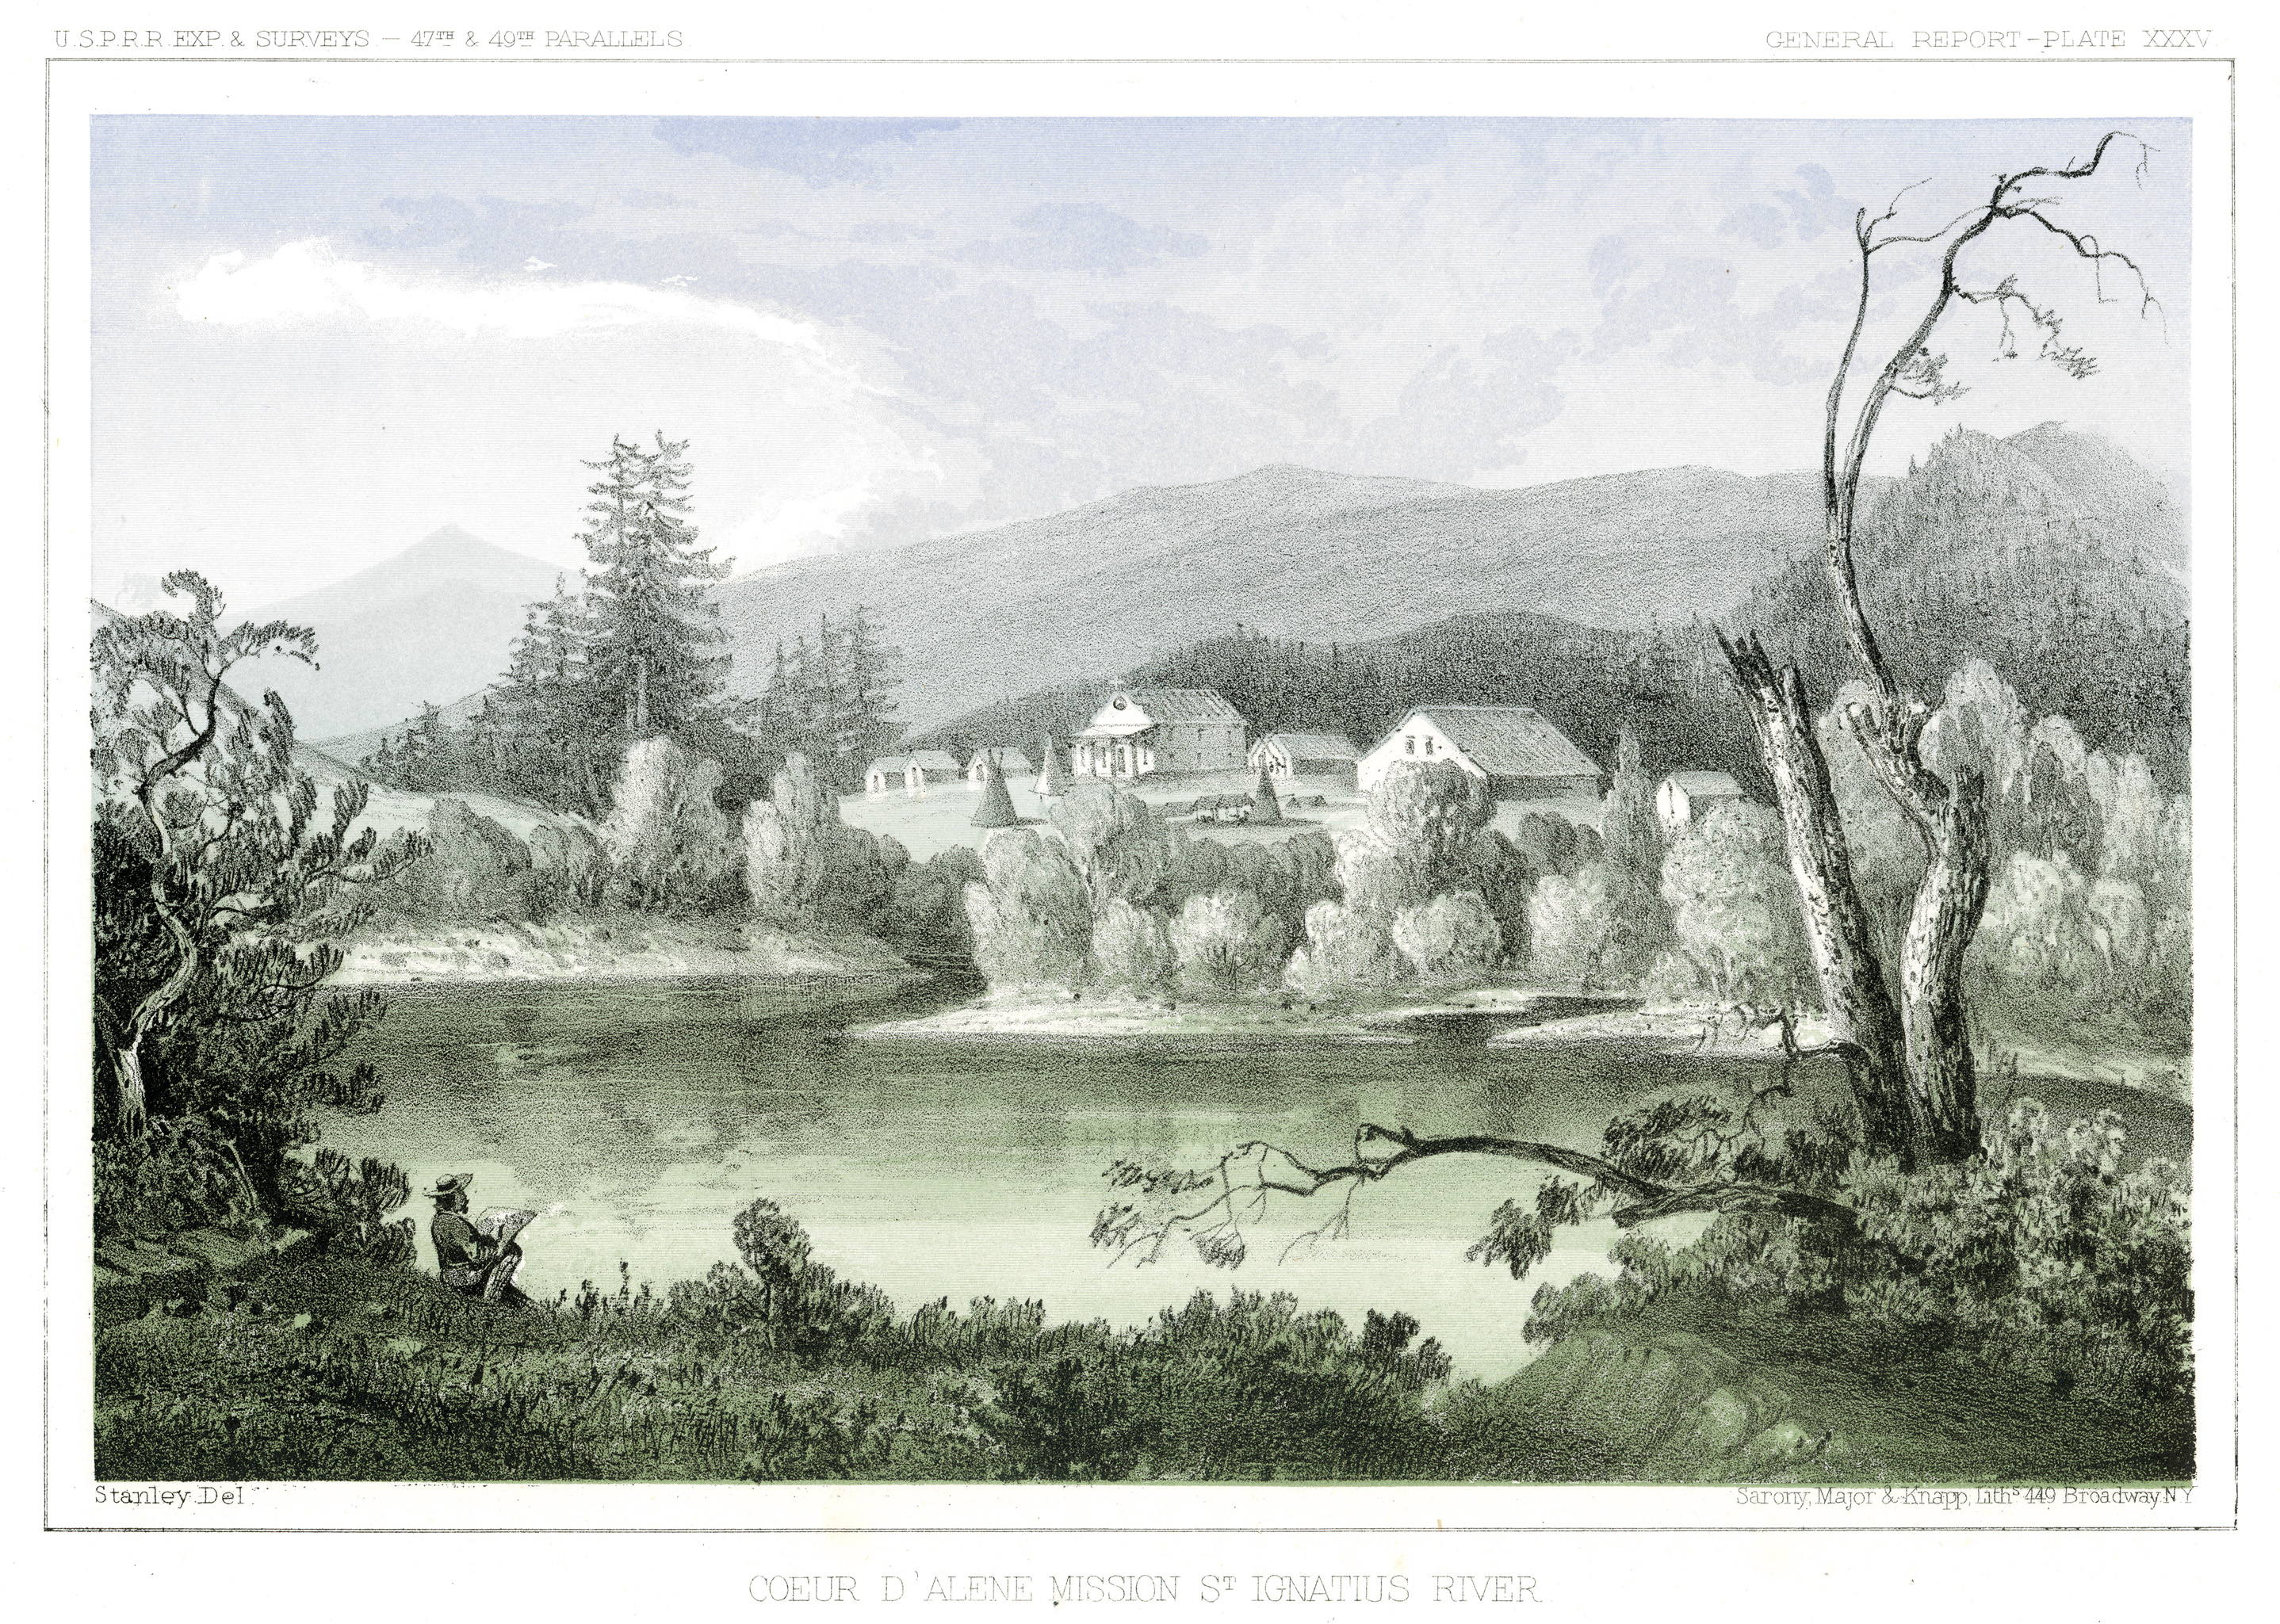 Coeur D'Alene Mission St. Ignatius River